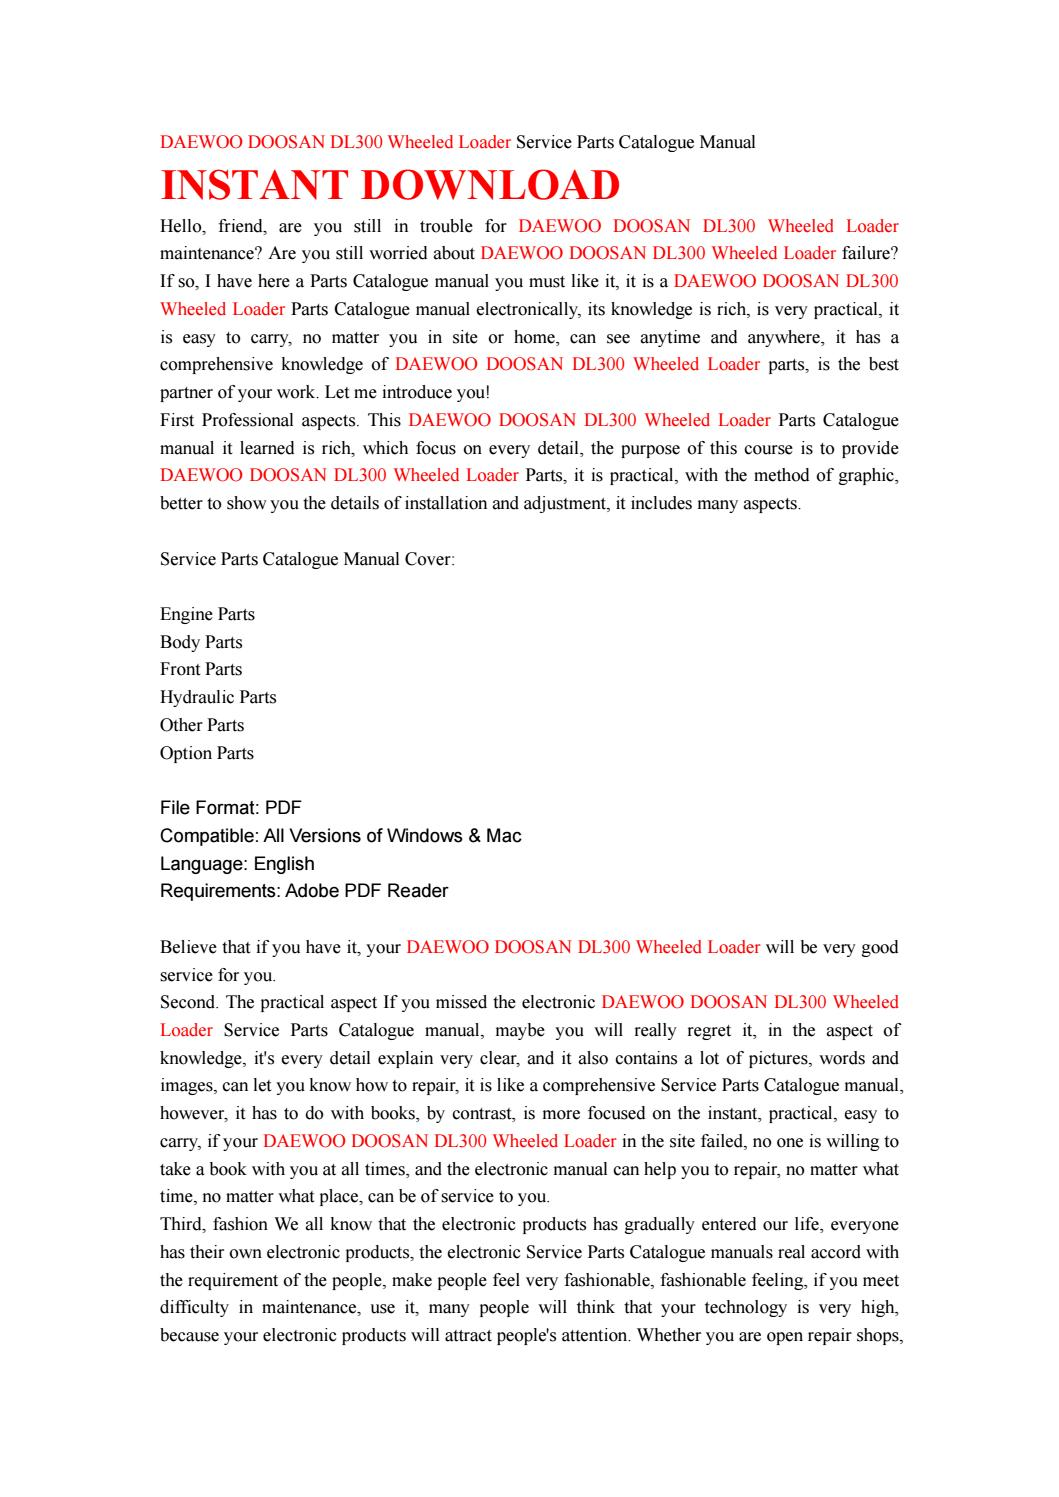 Daewoo doosan dl300 wheeled loader service parts catalogue manual by  kfjsjfnsef - issuu